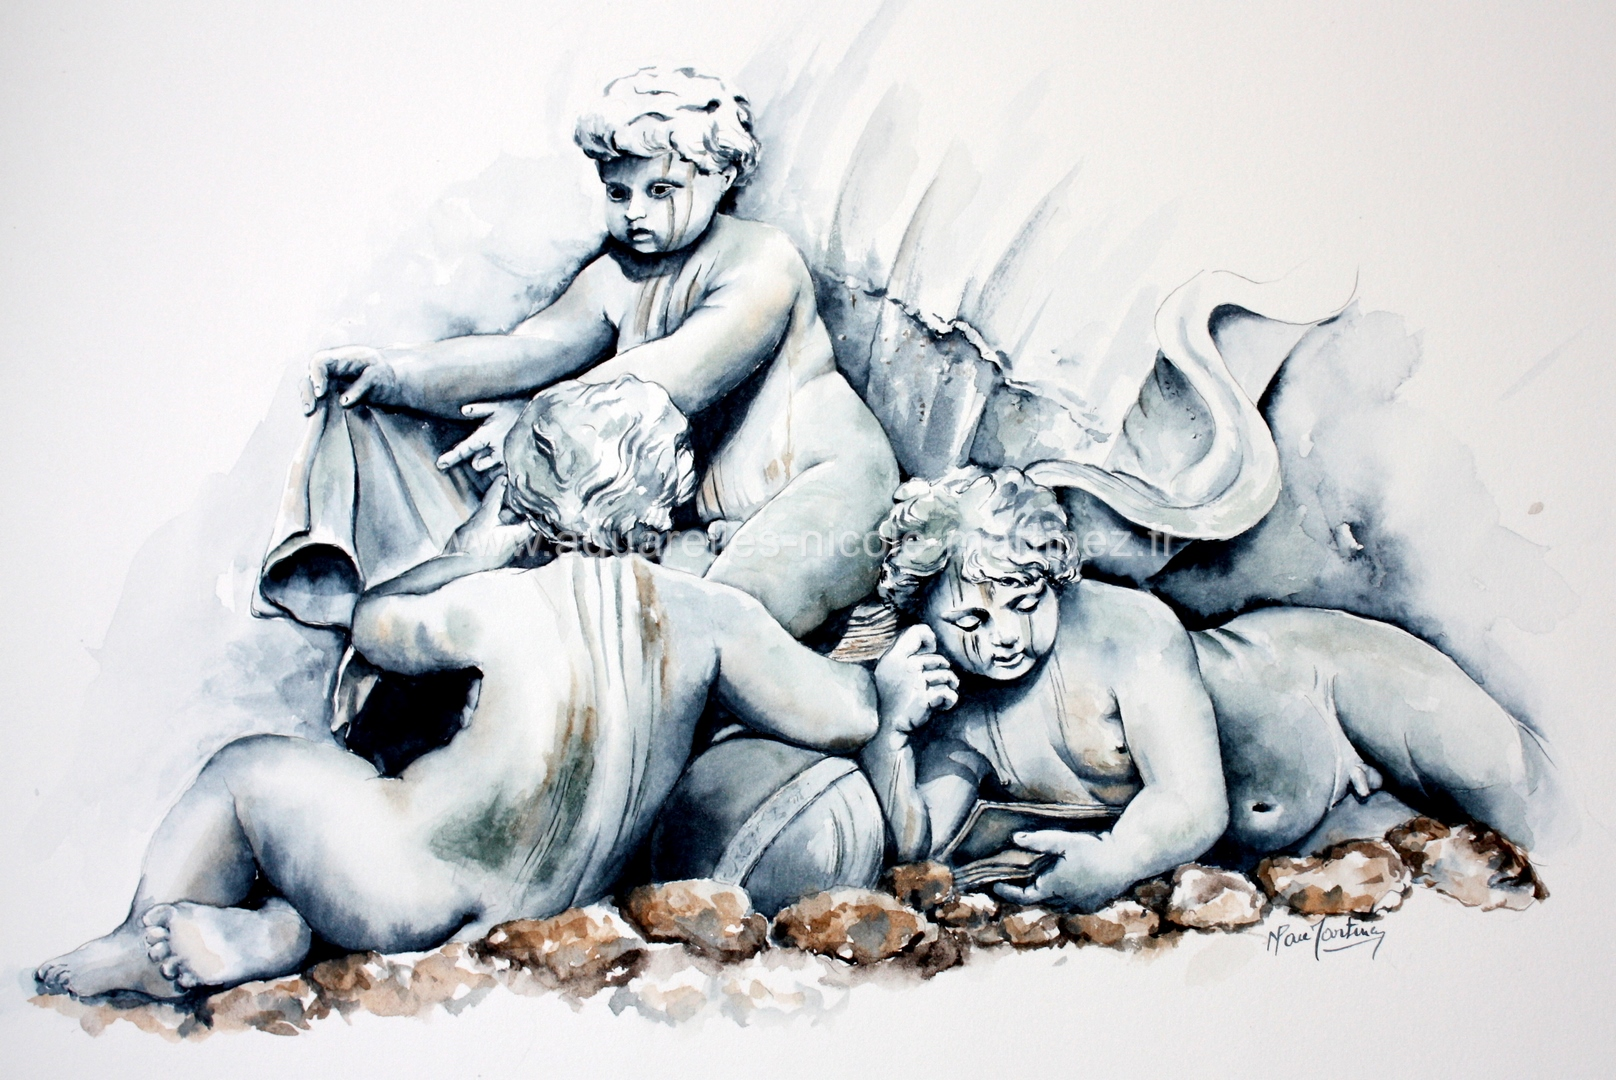 Les Chérubins - Fontaine des Girondins